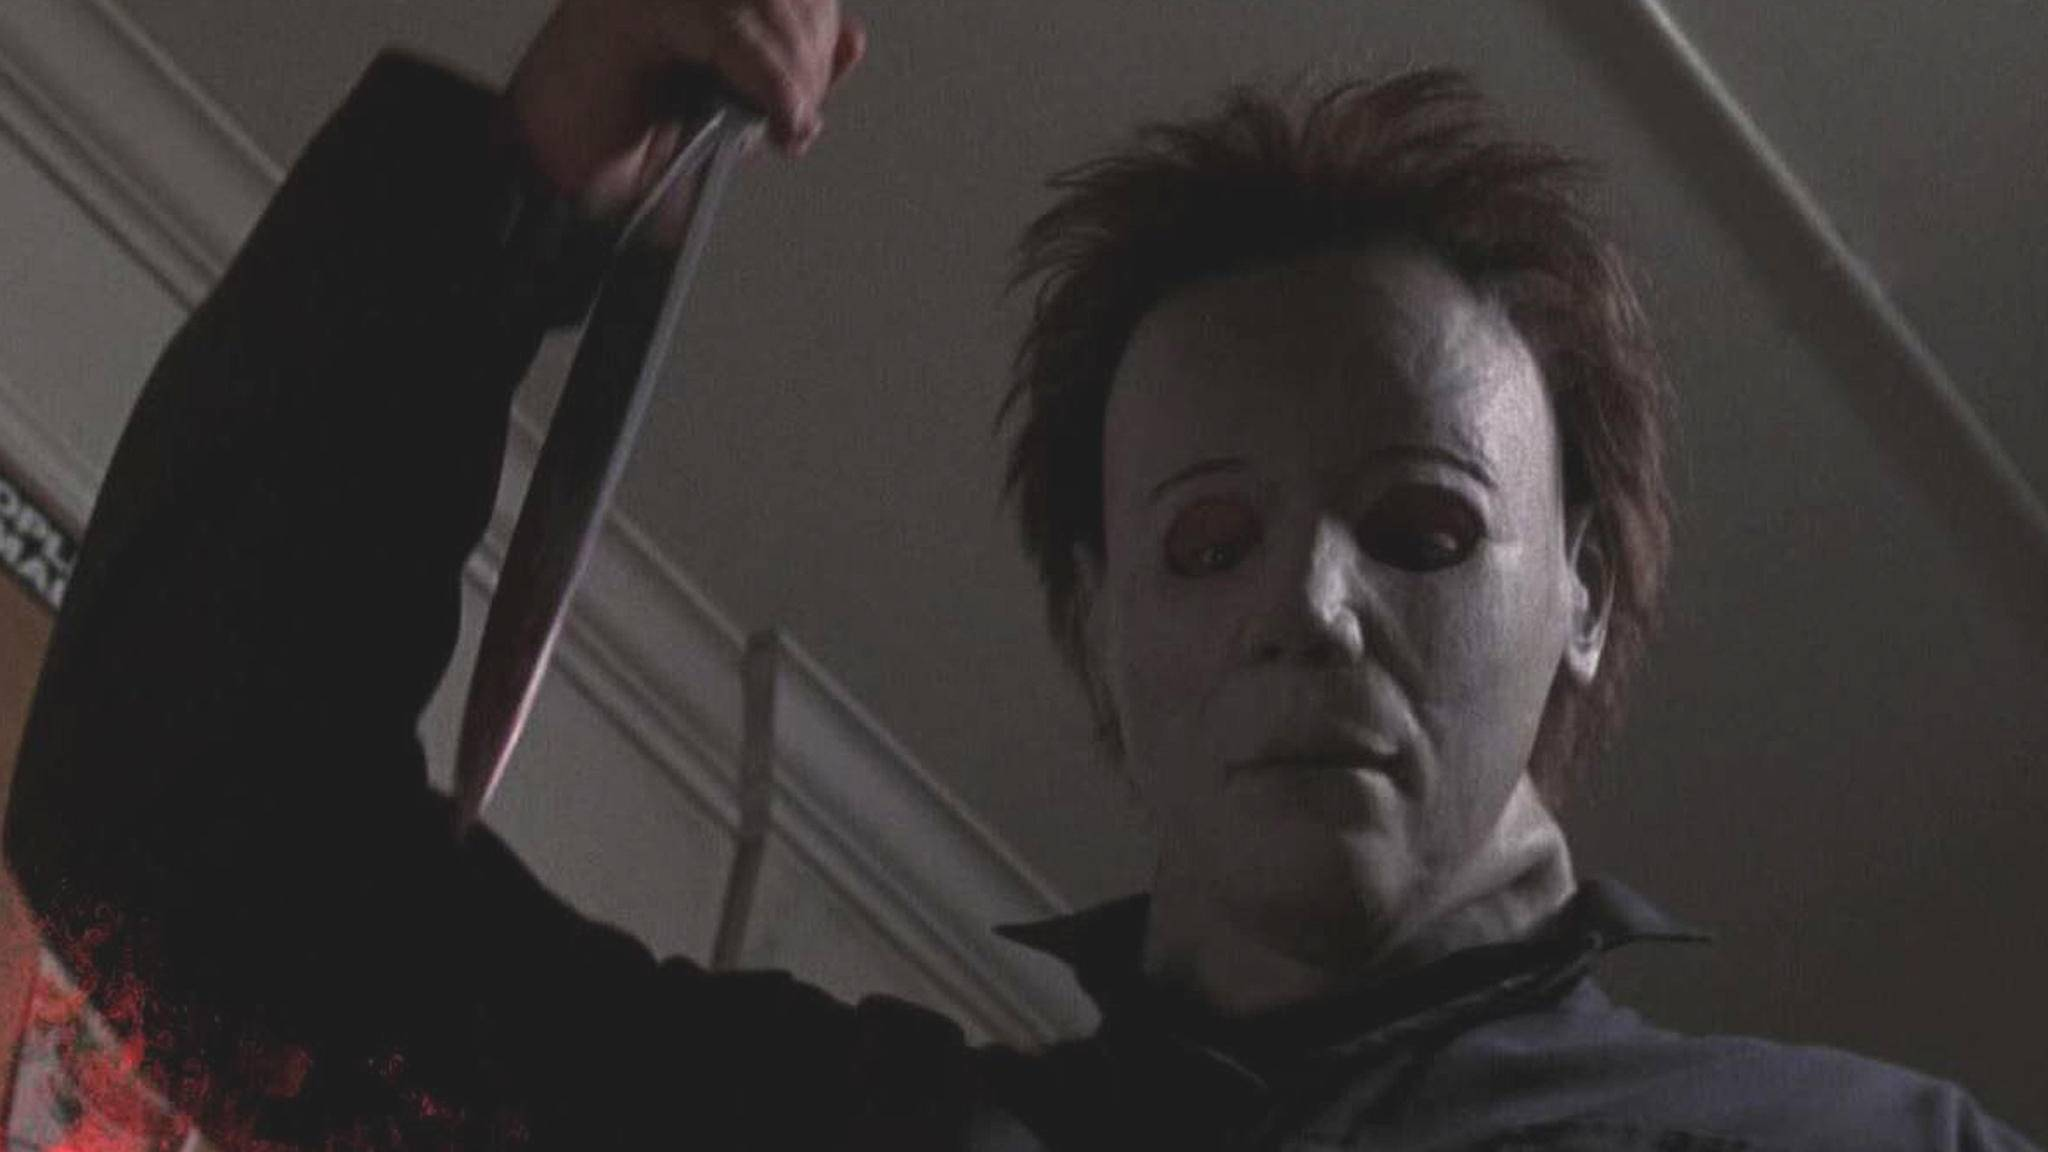 Guess who's back? Halloween 2018 wird wieder mörderisch.